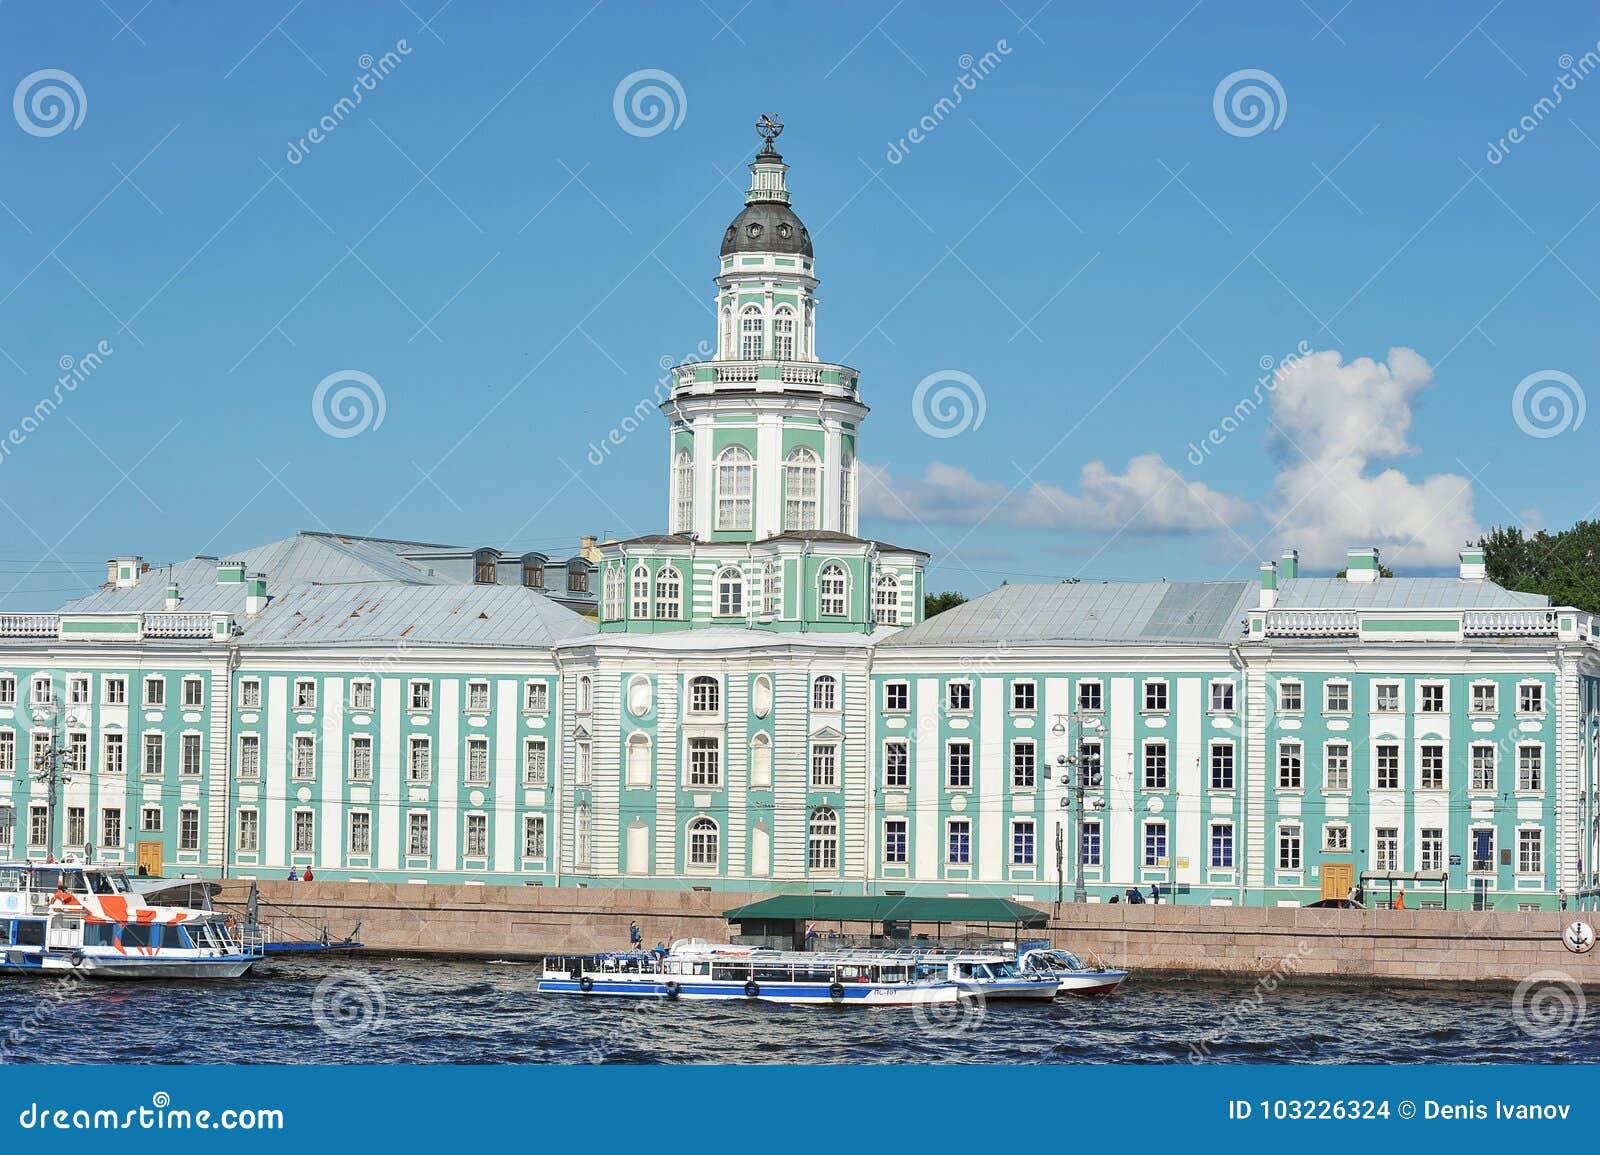 The Kunstkamera Museum in Saint-Petersburg on the University embankment of the Neva river